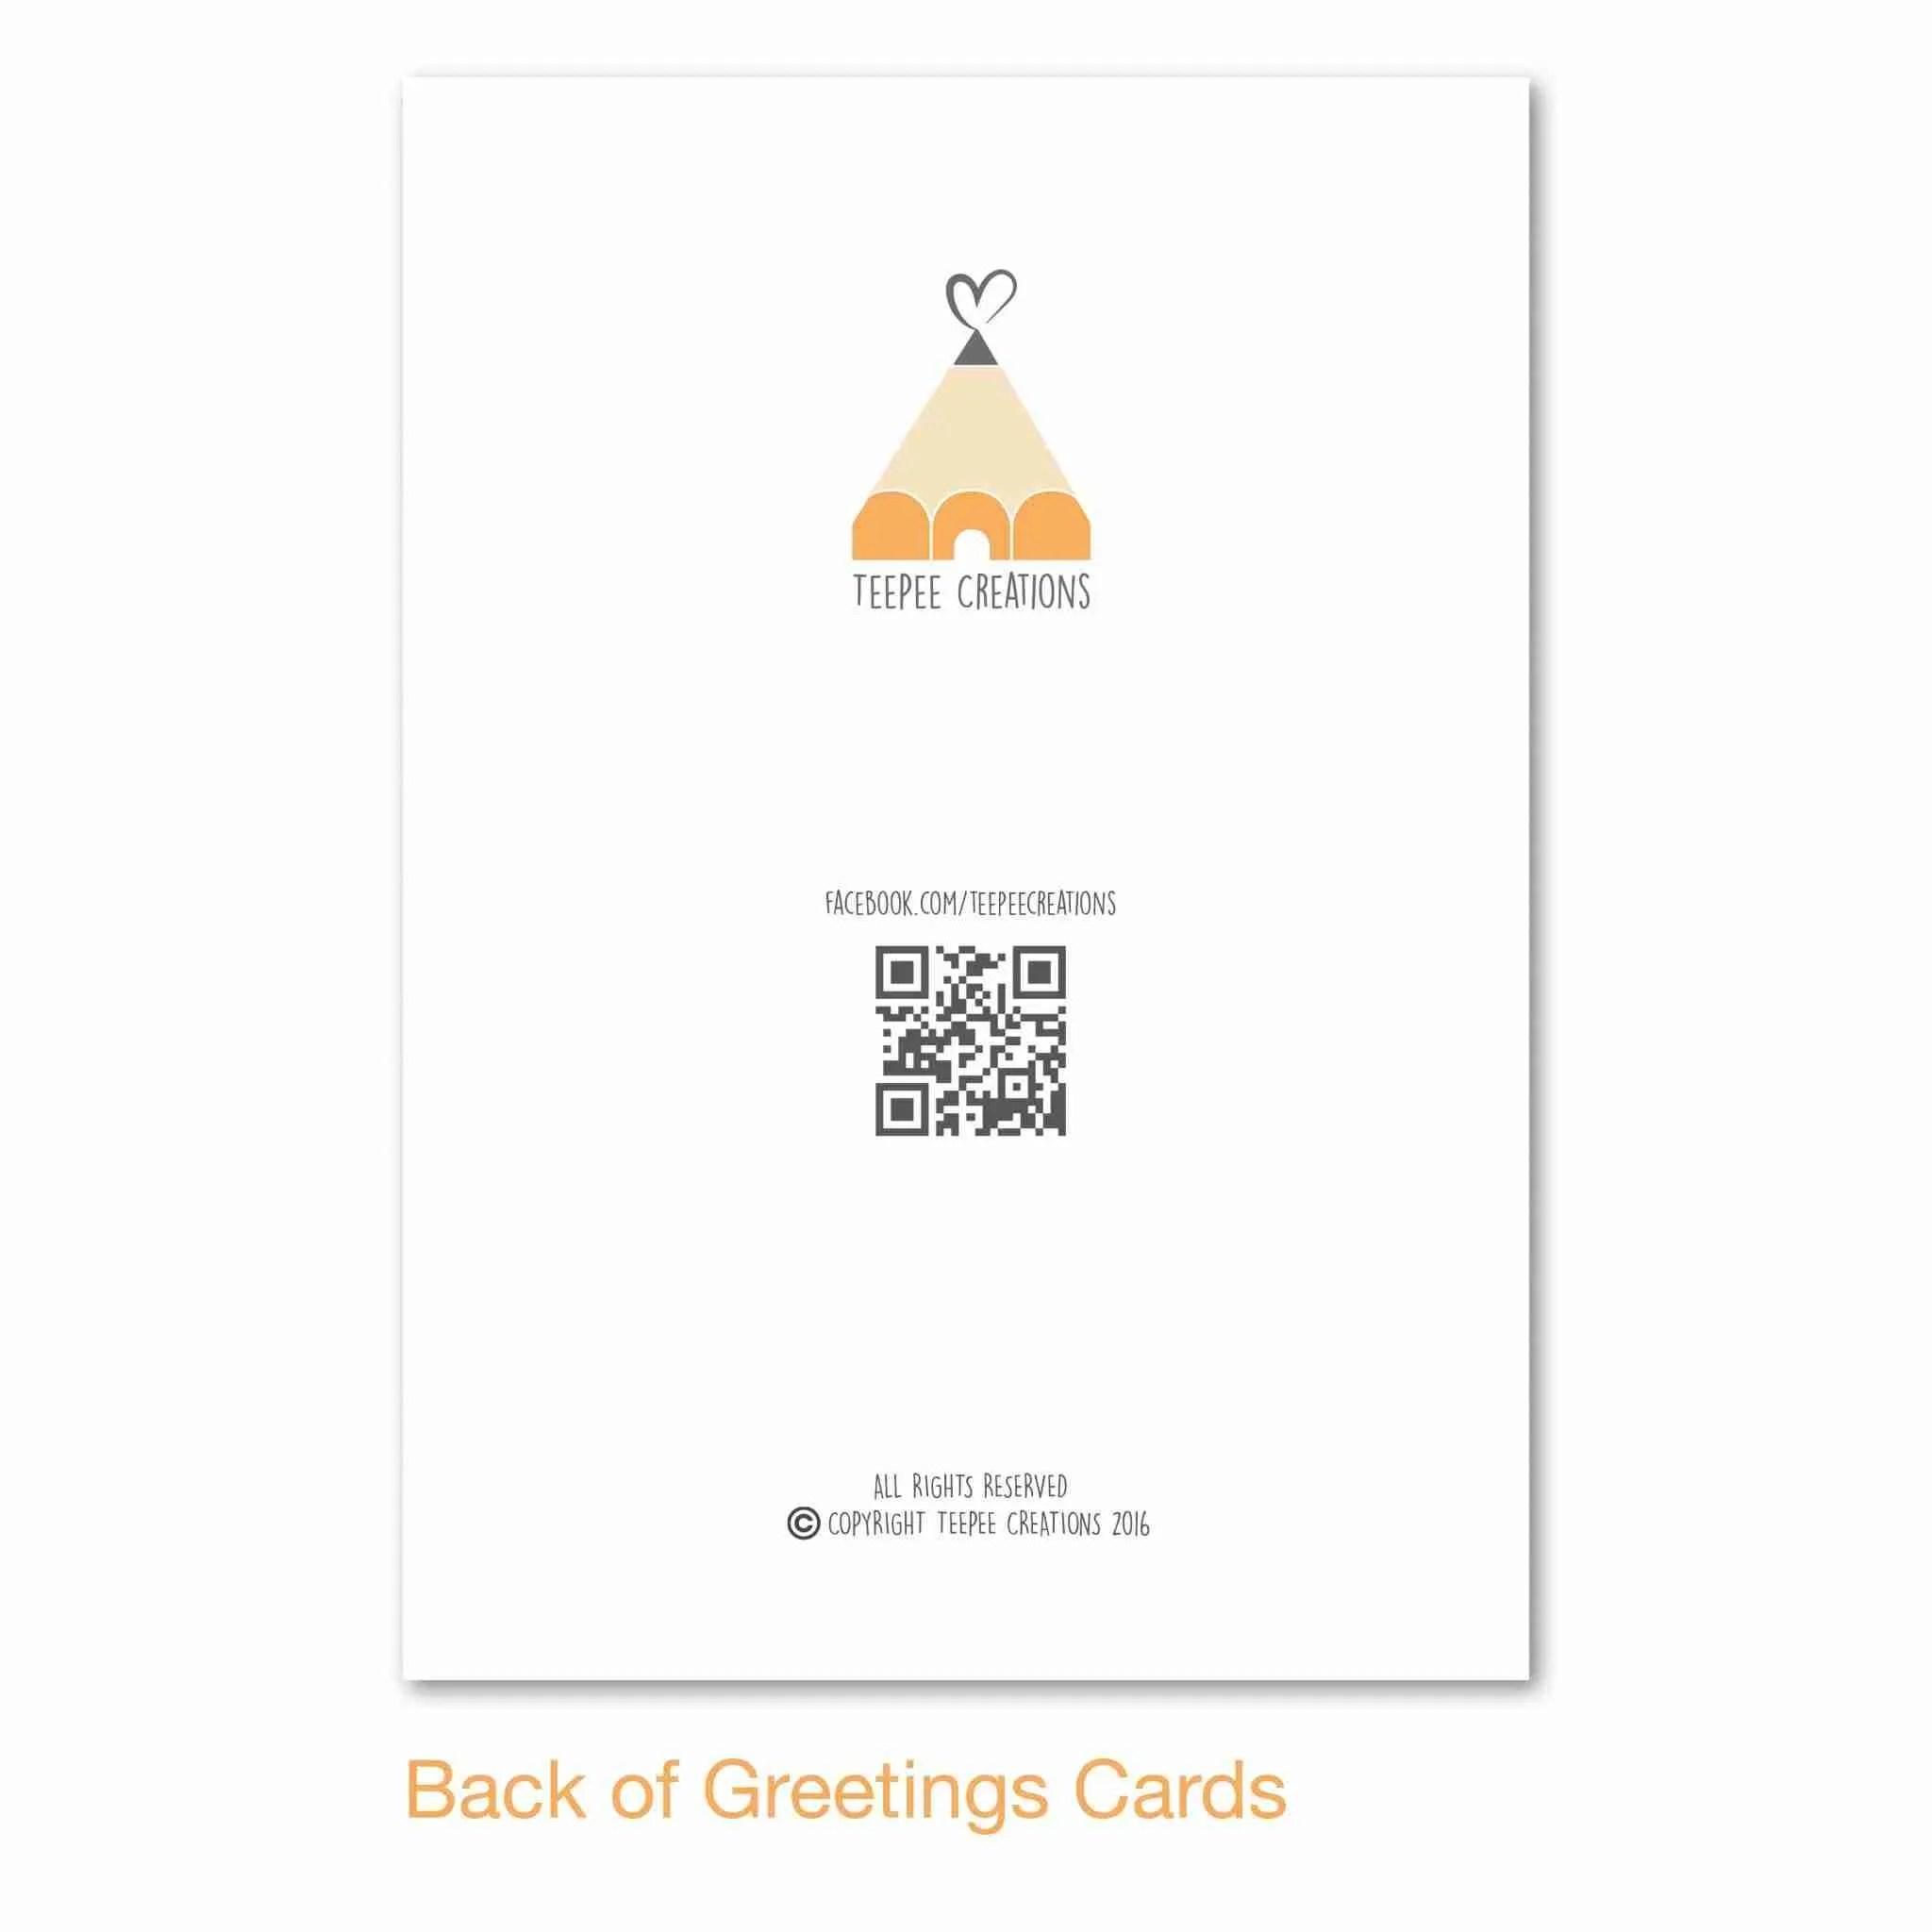 Business Card Teepee Creations